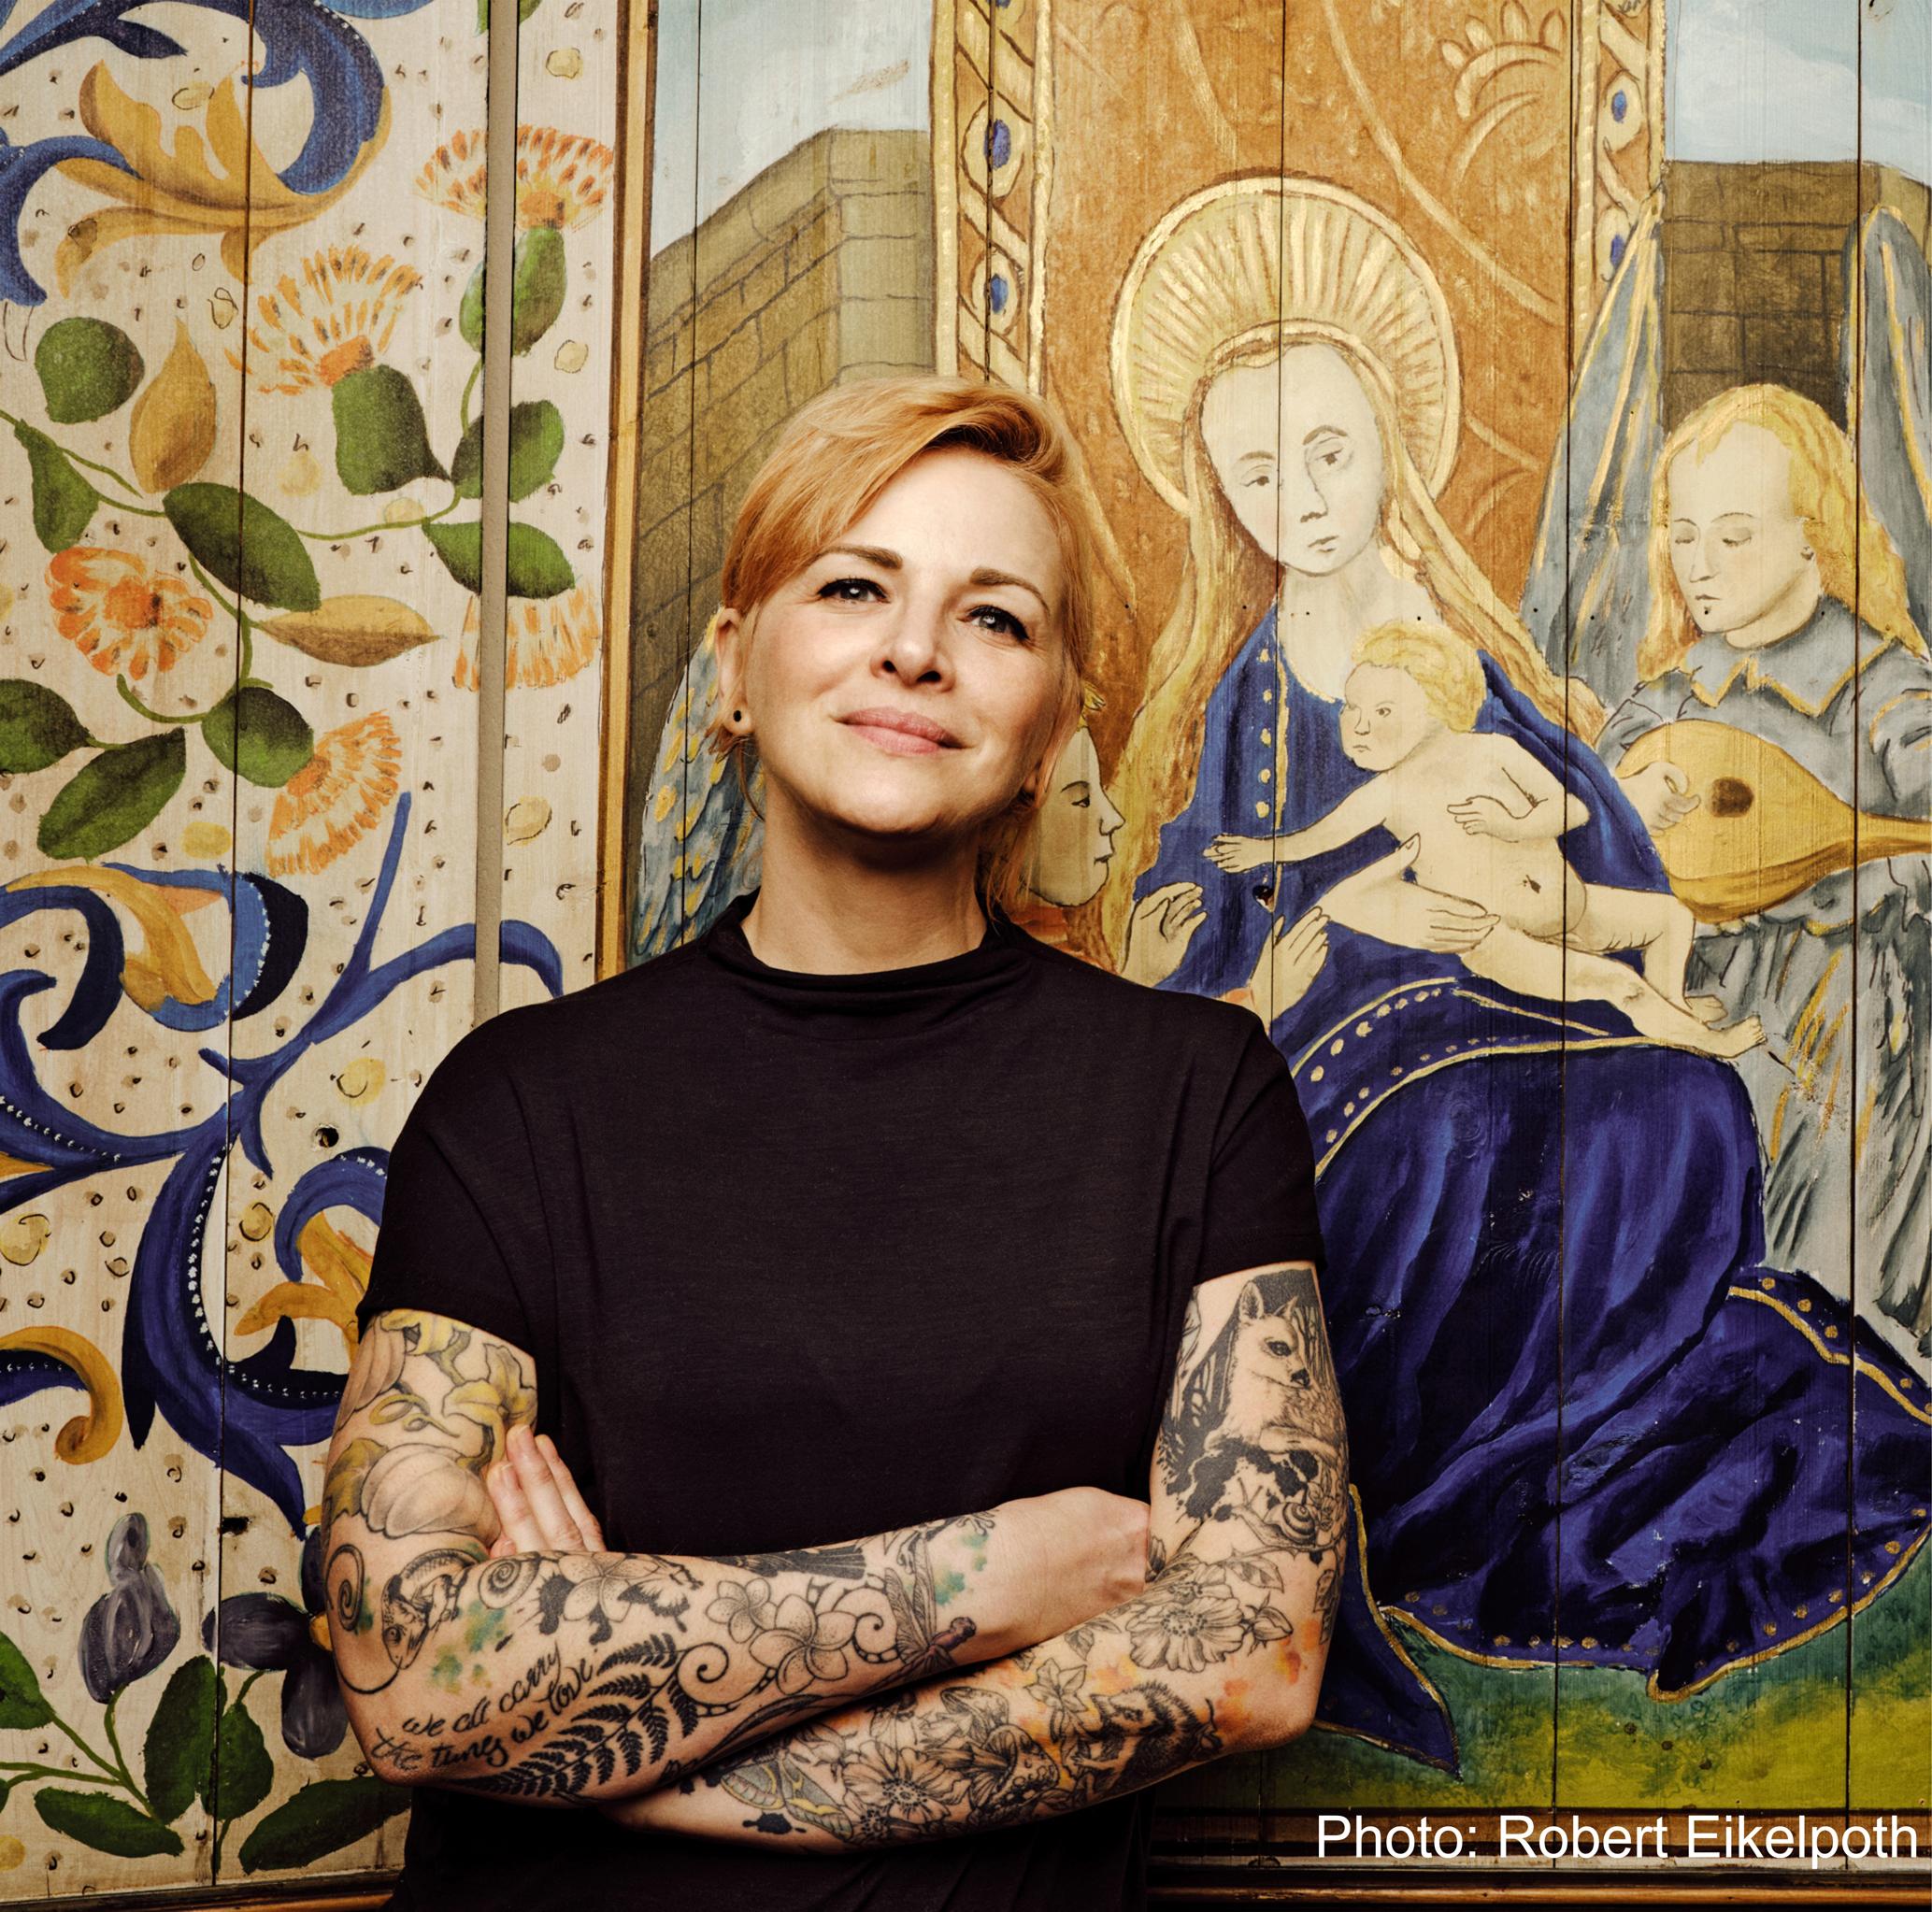 Image of Ines Maybaum